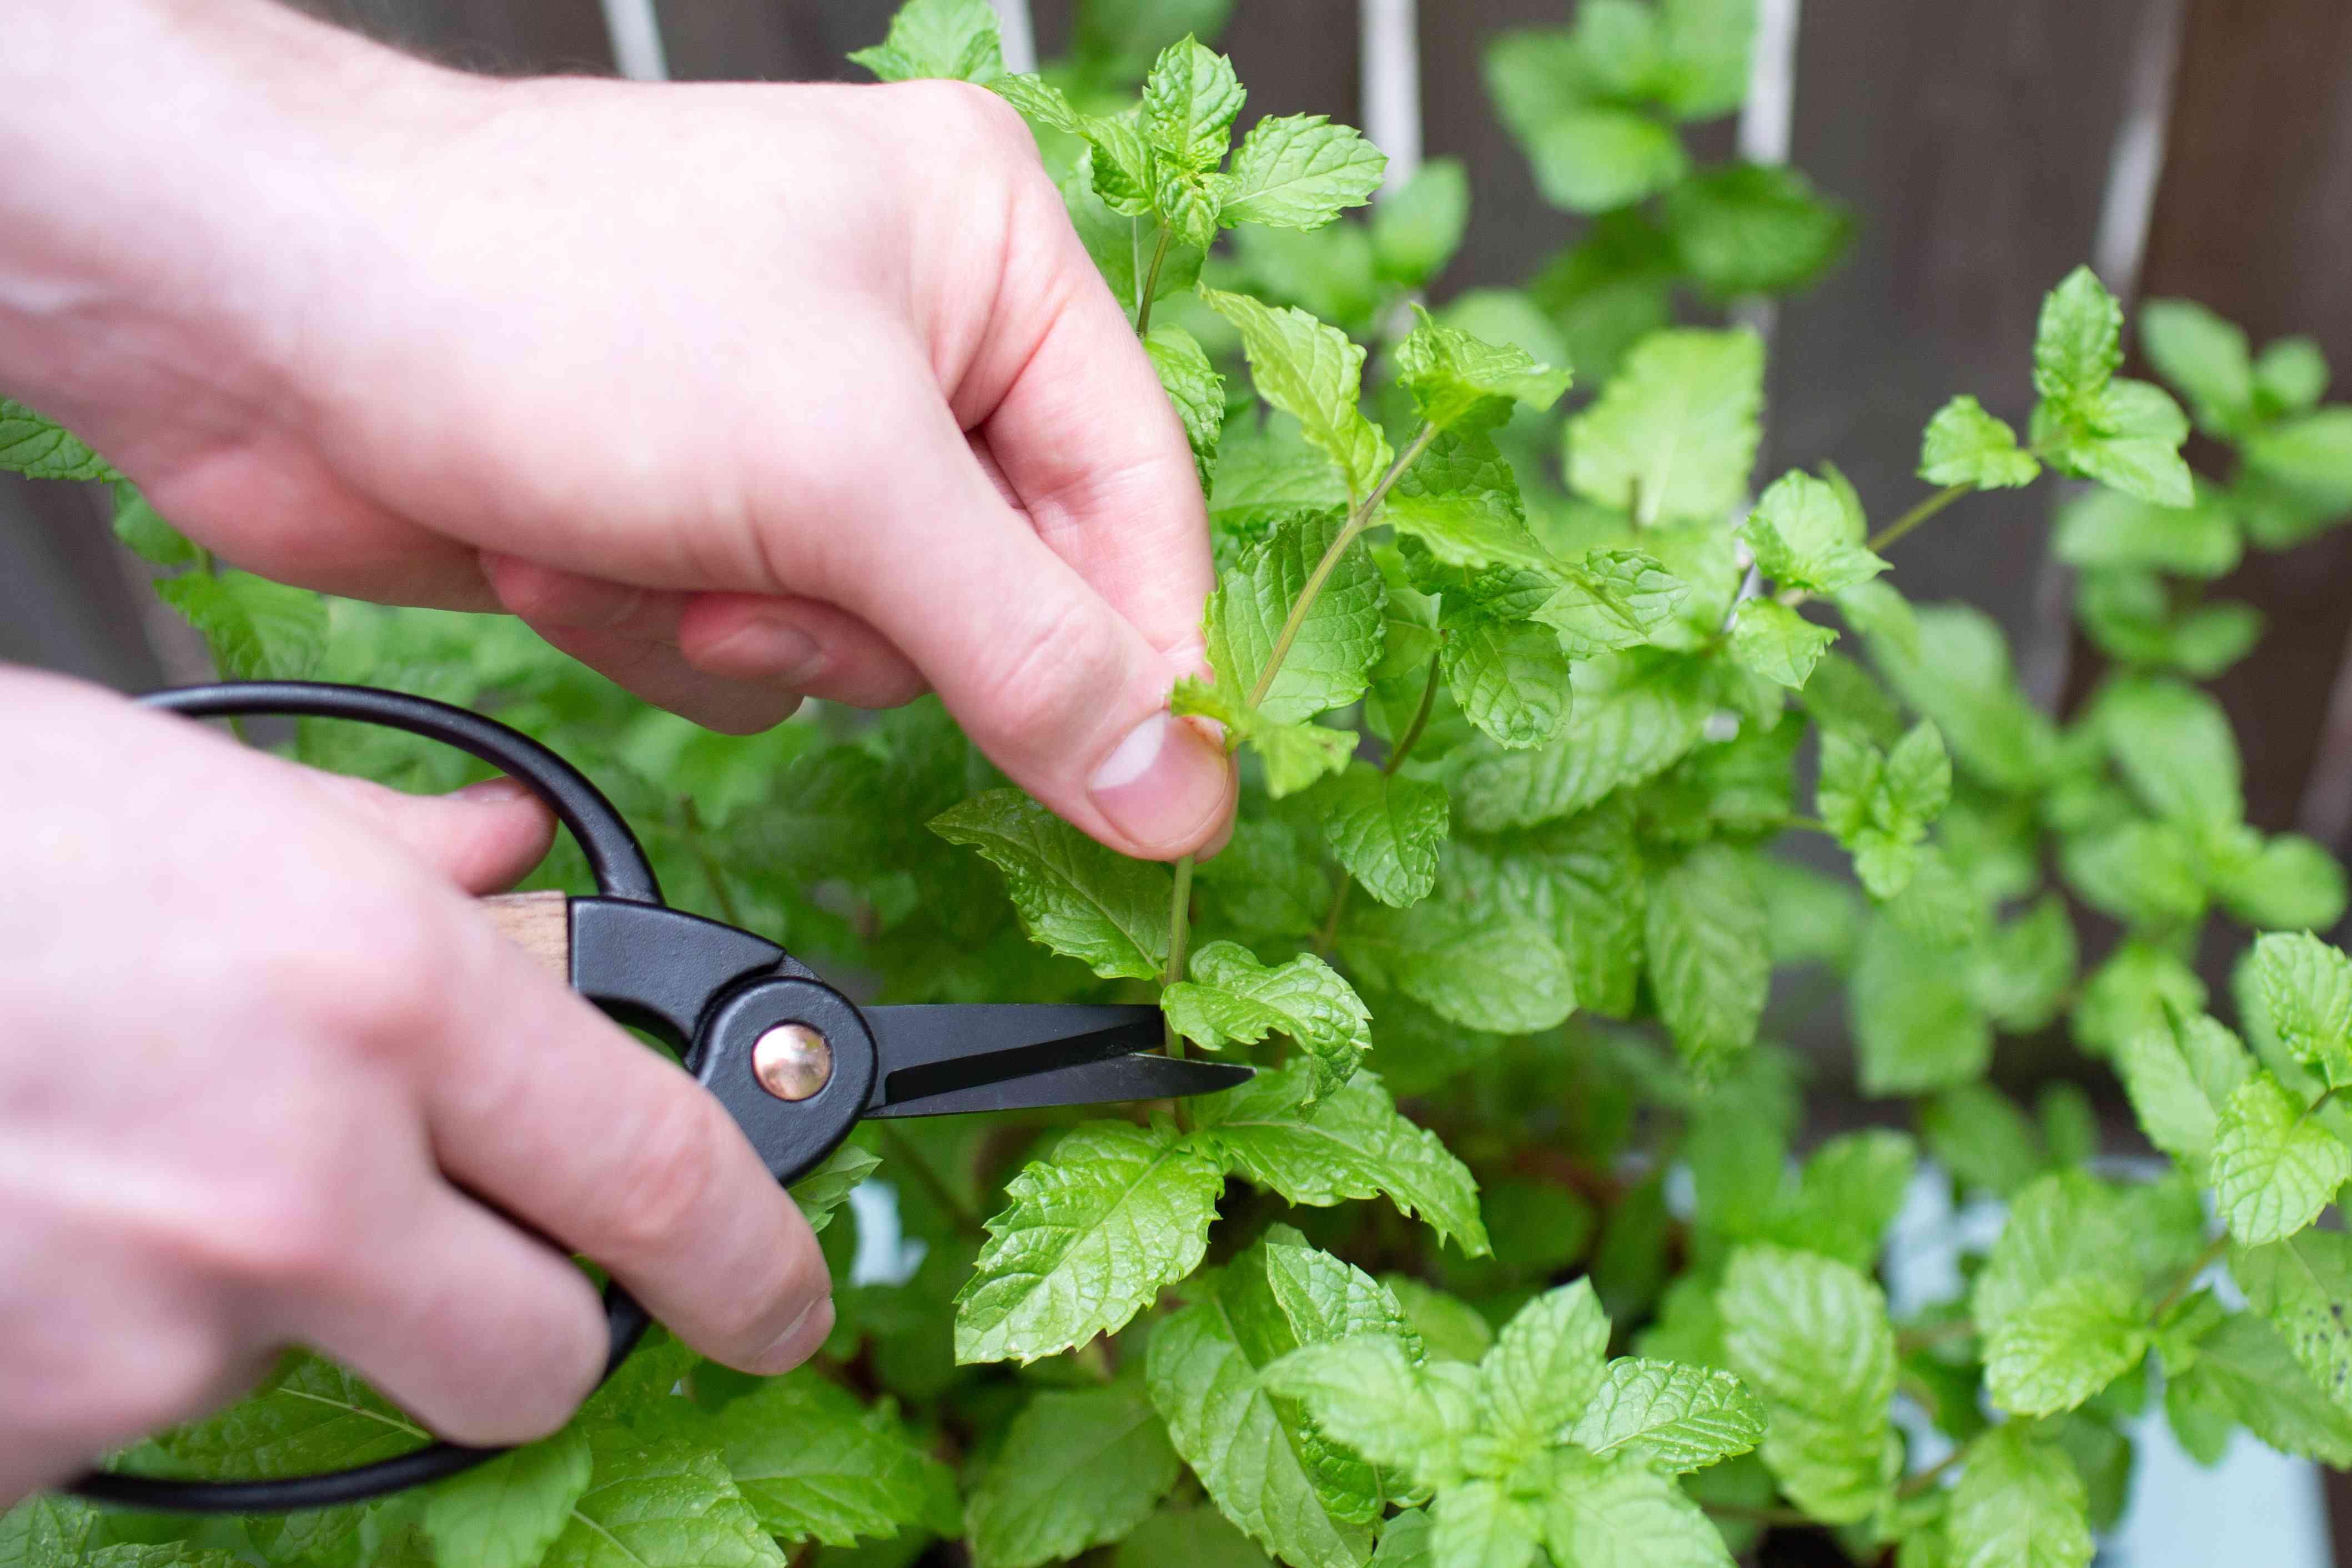 person pruning herbs with garden scissors